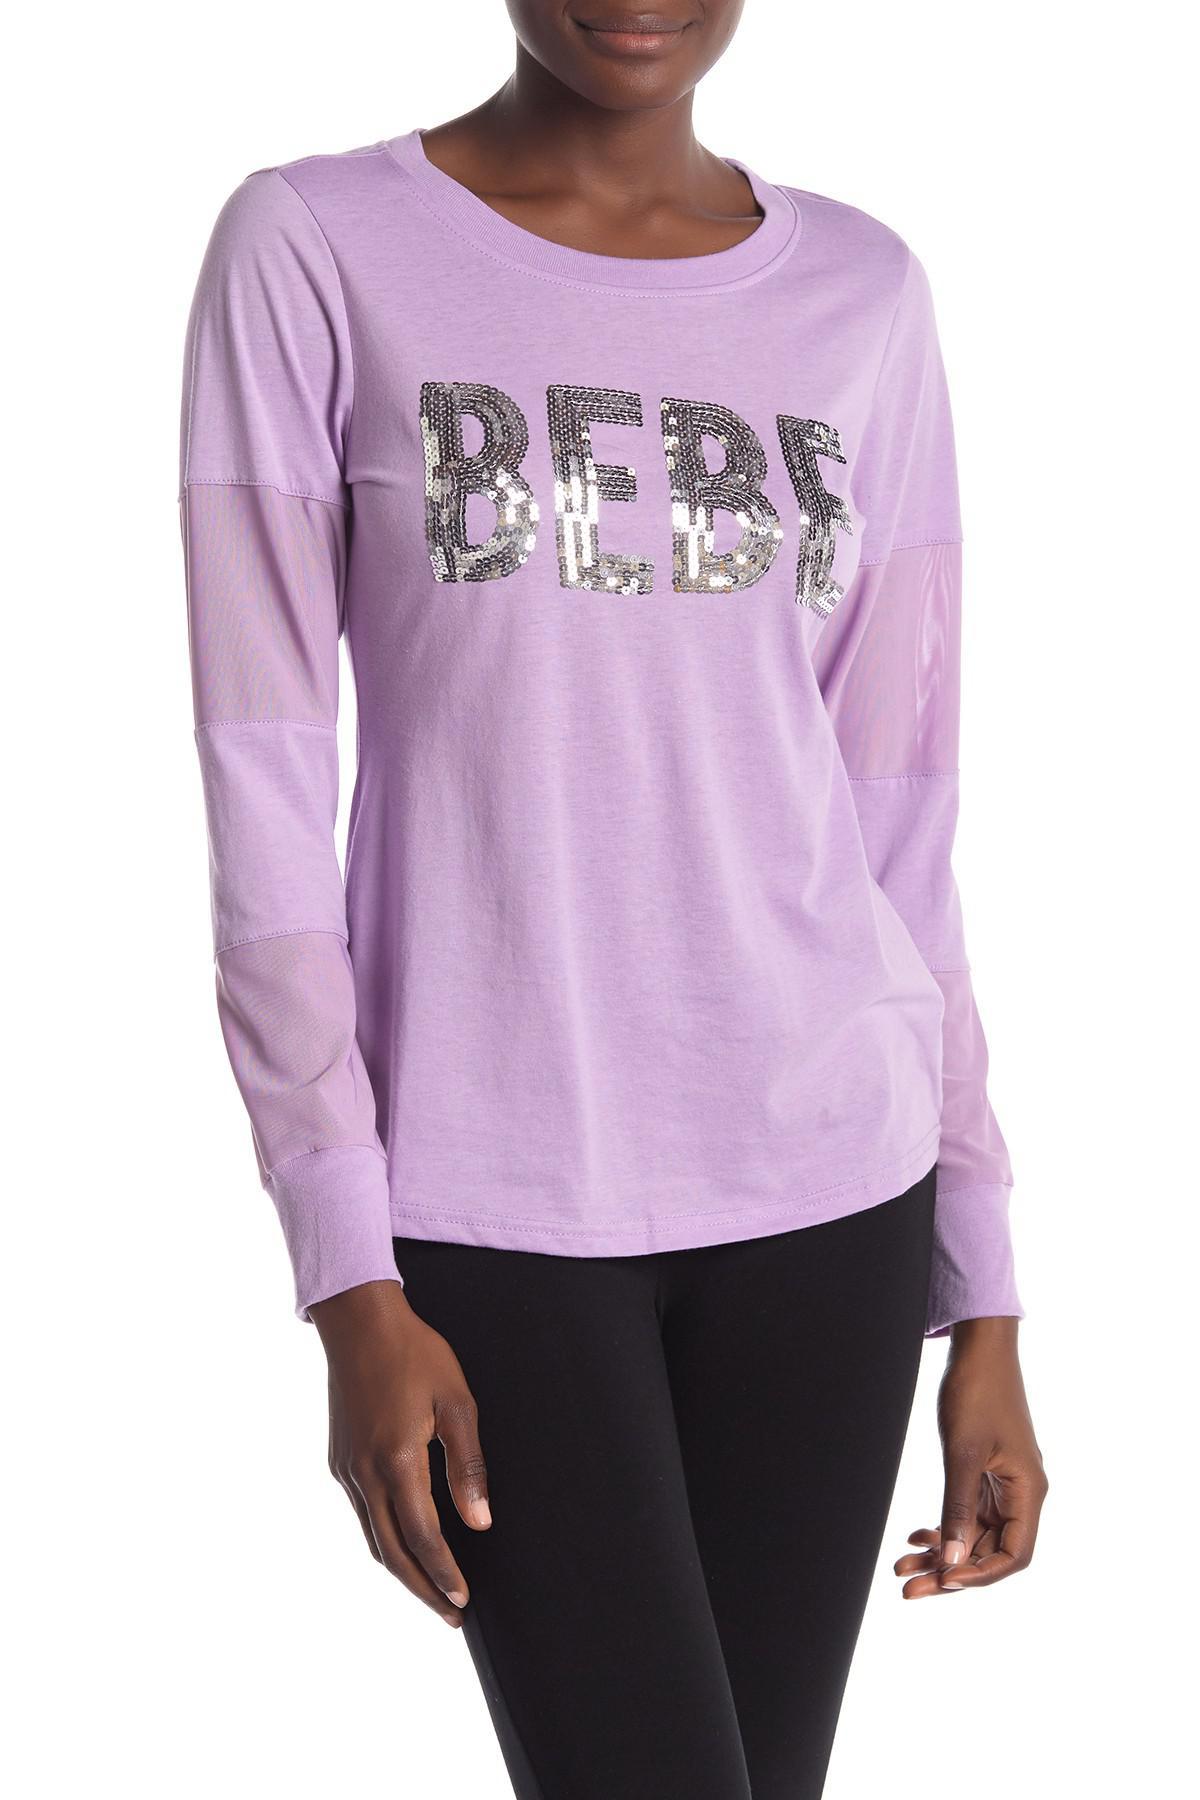 cde1d7b70fe82d Lyst - Bebe Sequin Logo Mesh Panel Pullover in Purple